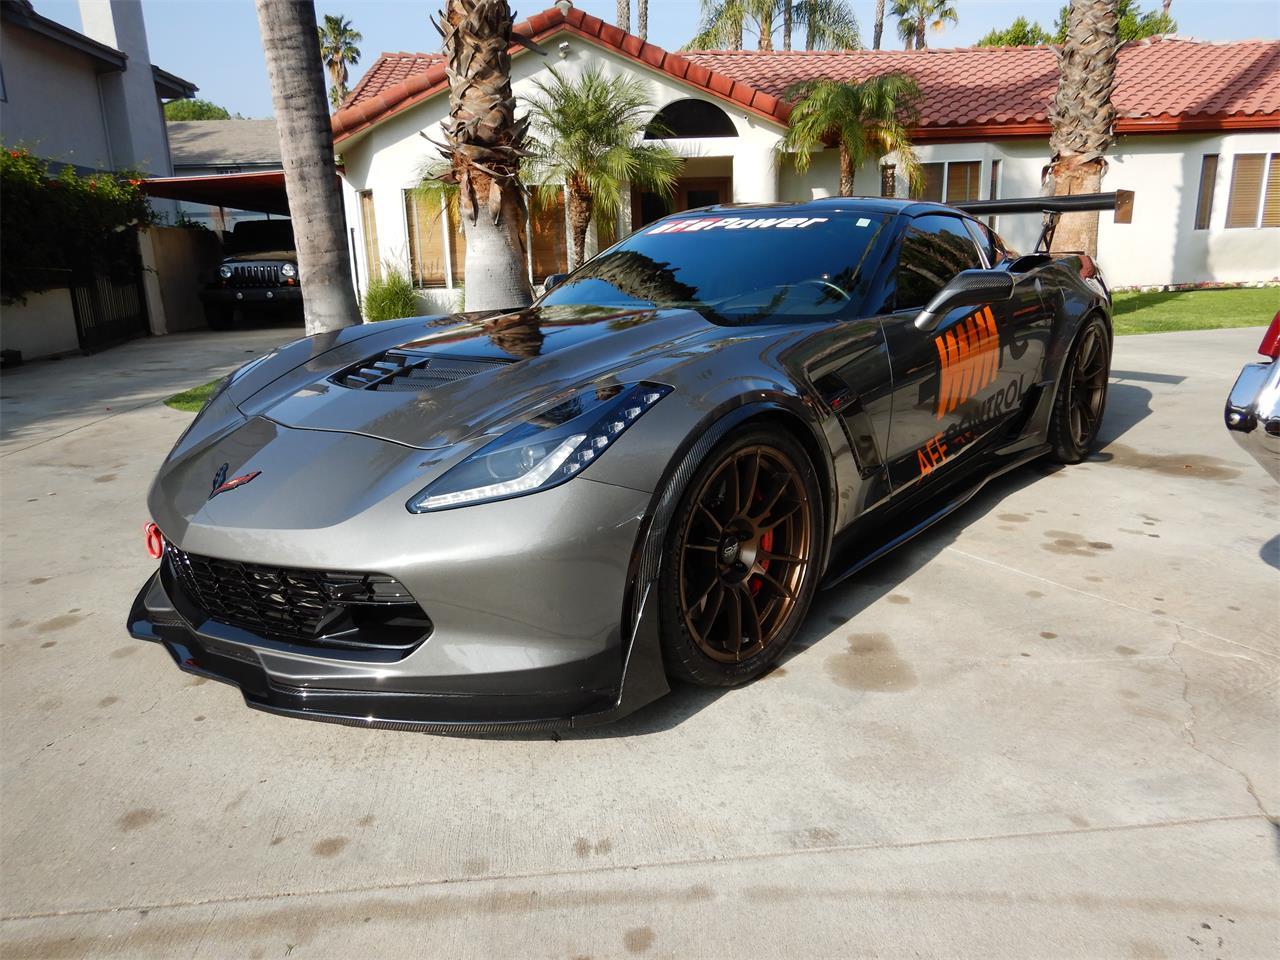 corvette z06 chevrolet woodland hills california classic cc classiccars financing inspection insurance transport